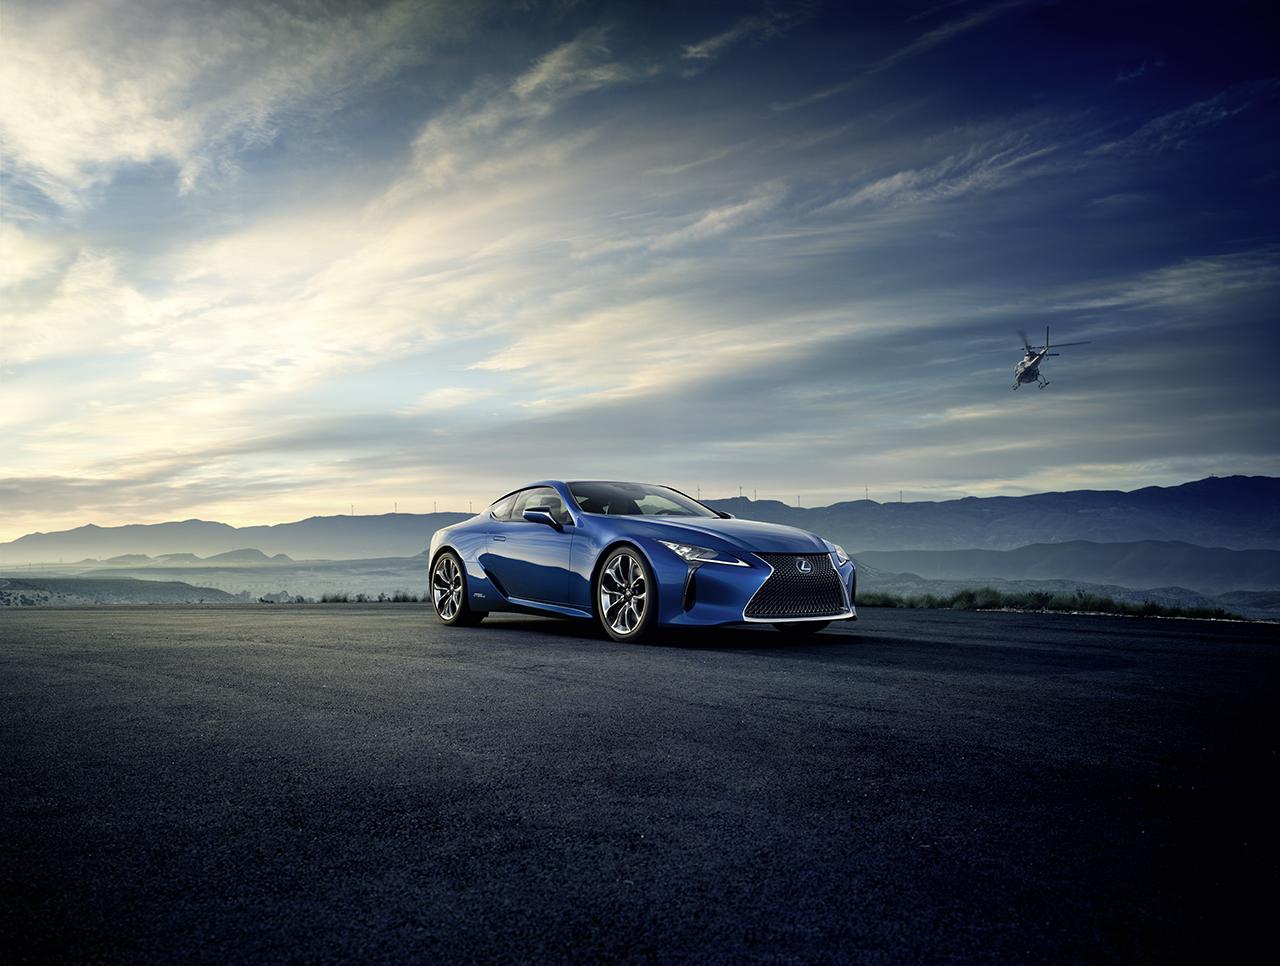 2016 Geneva Preview - Lexus LC500h